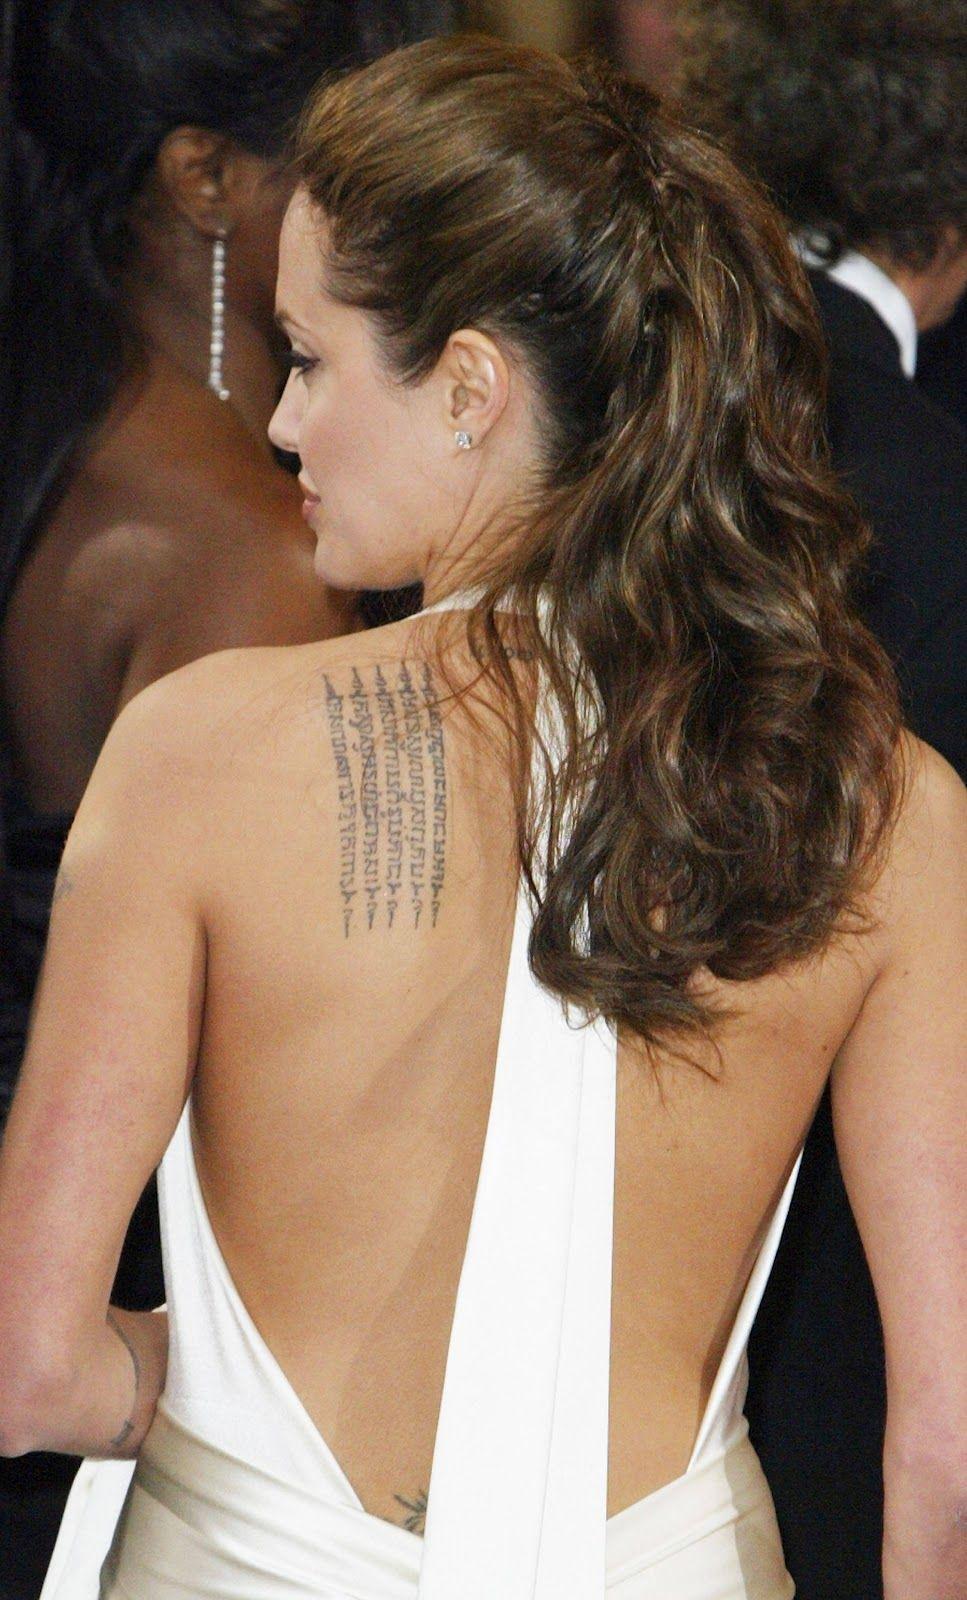 Angelina Jolie Tattoo Hip Meaning